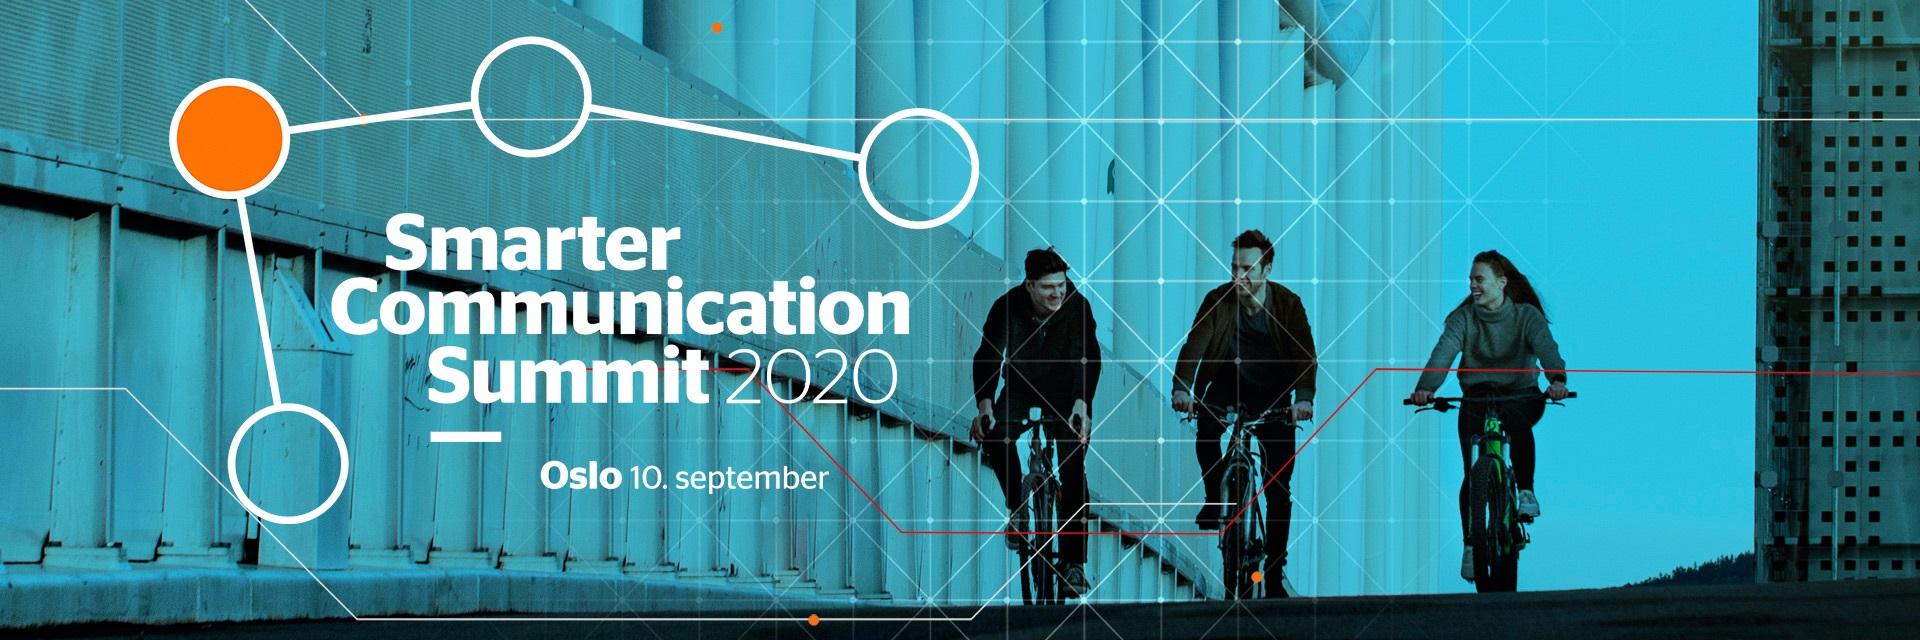 Summit-2020_NO_Concept-image_3-1_10-mars.jpg